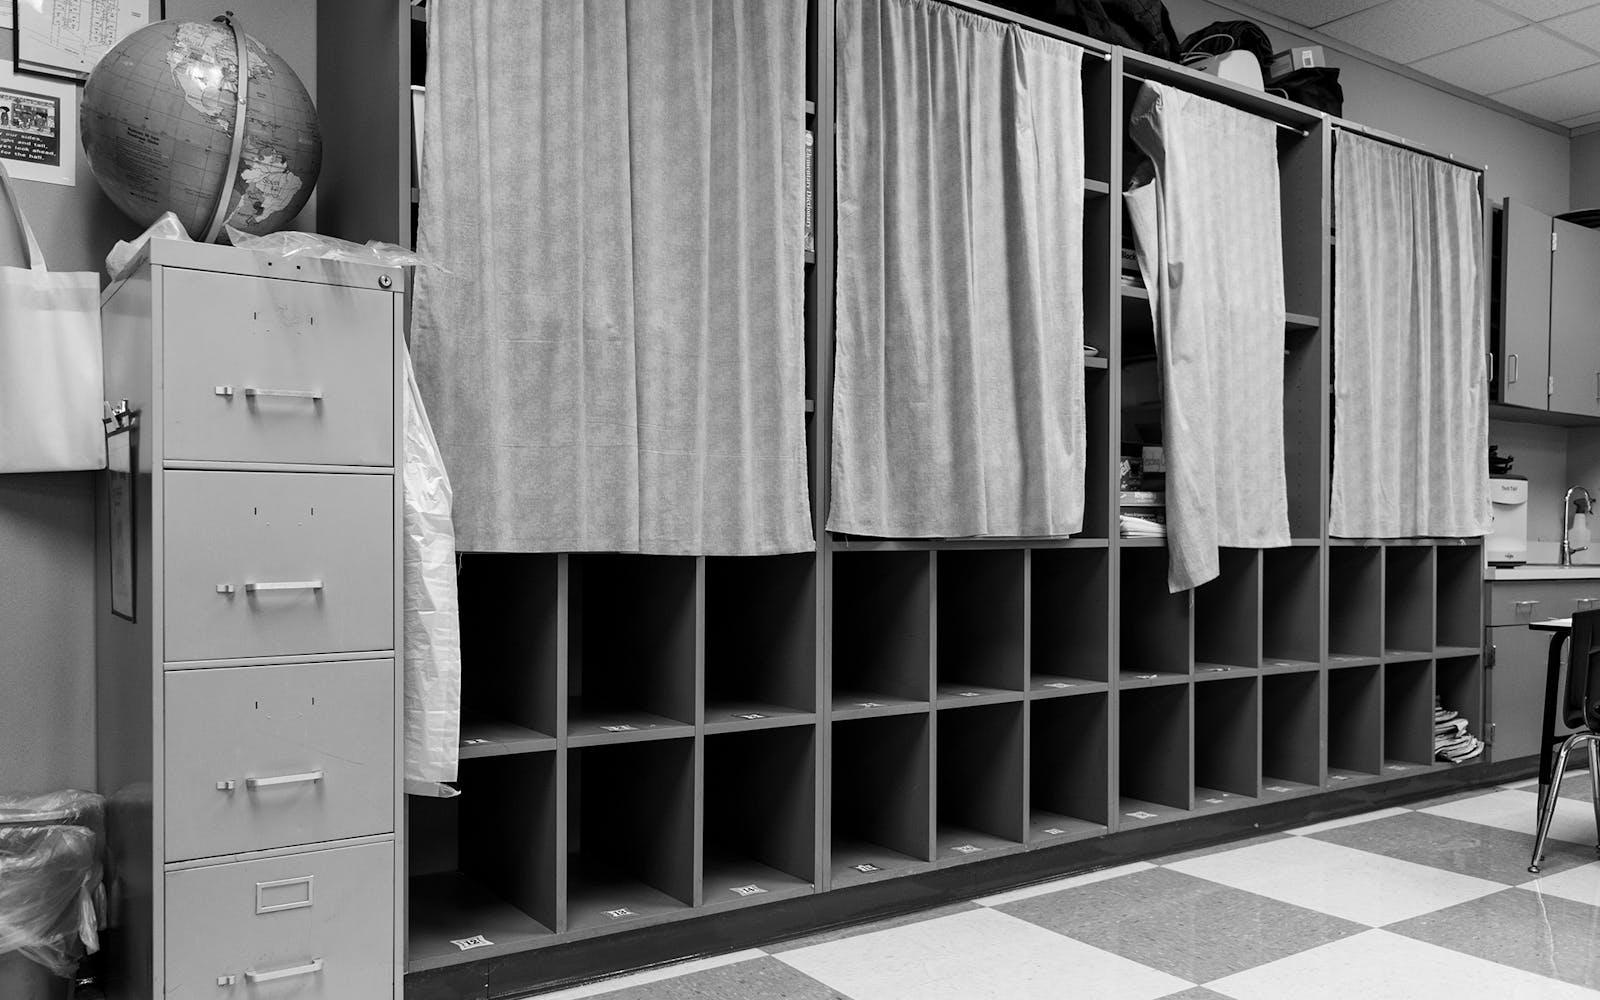 Empty school scene in Jasper, Texas